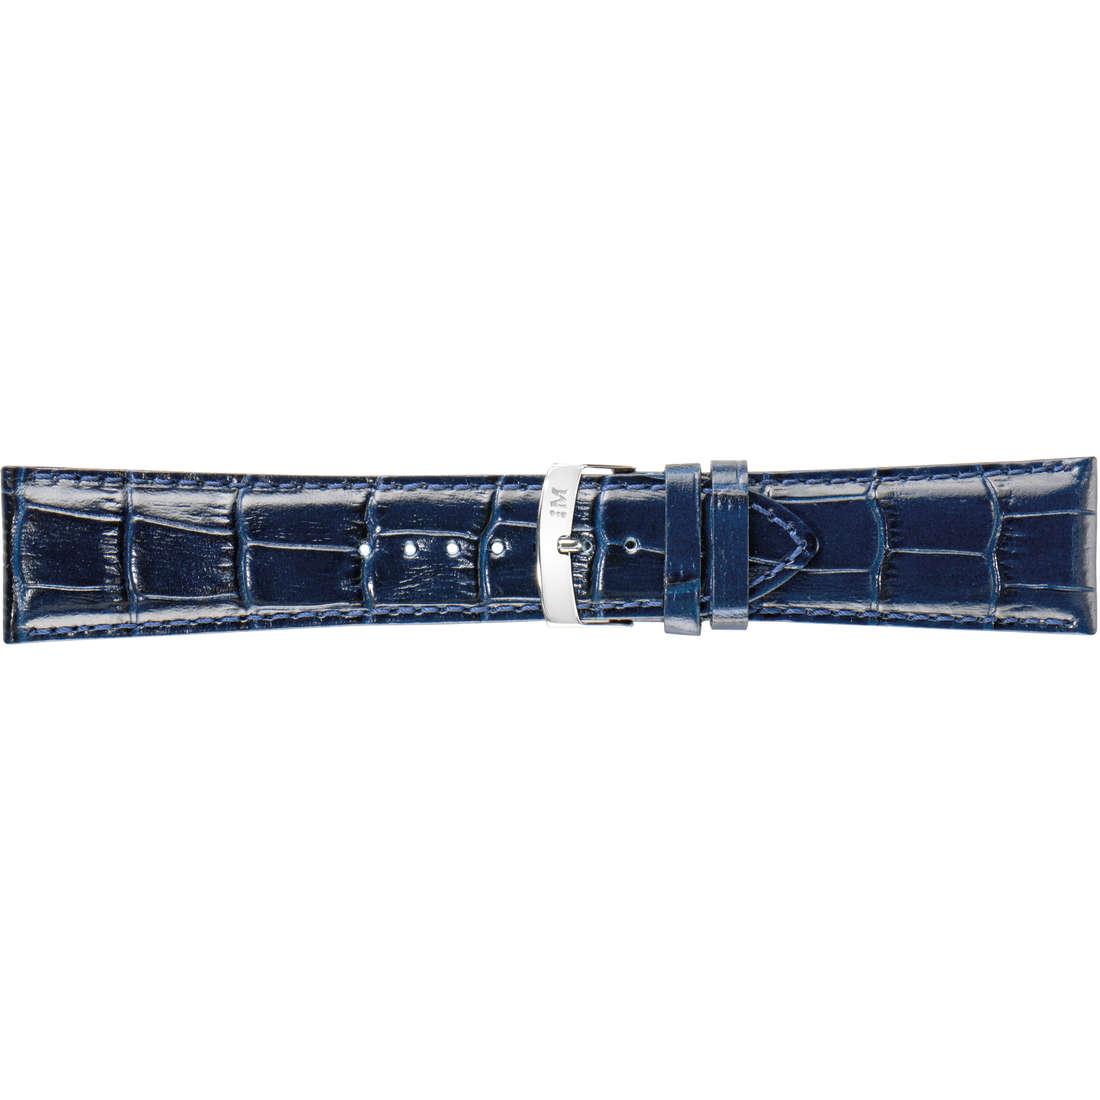 watch watch bands watch straps man Morellato Morellato 1930 A01X3395656062CR28